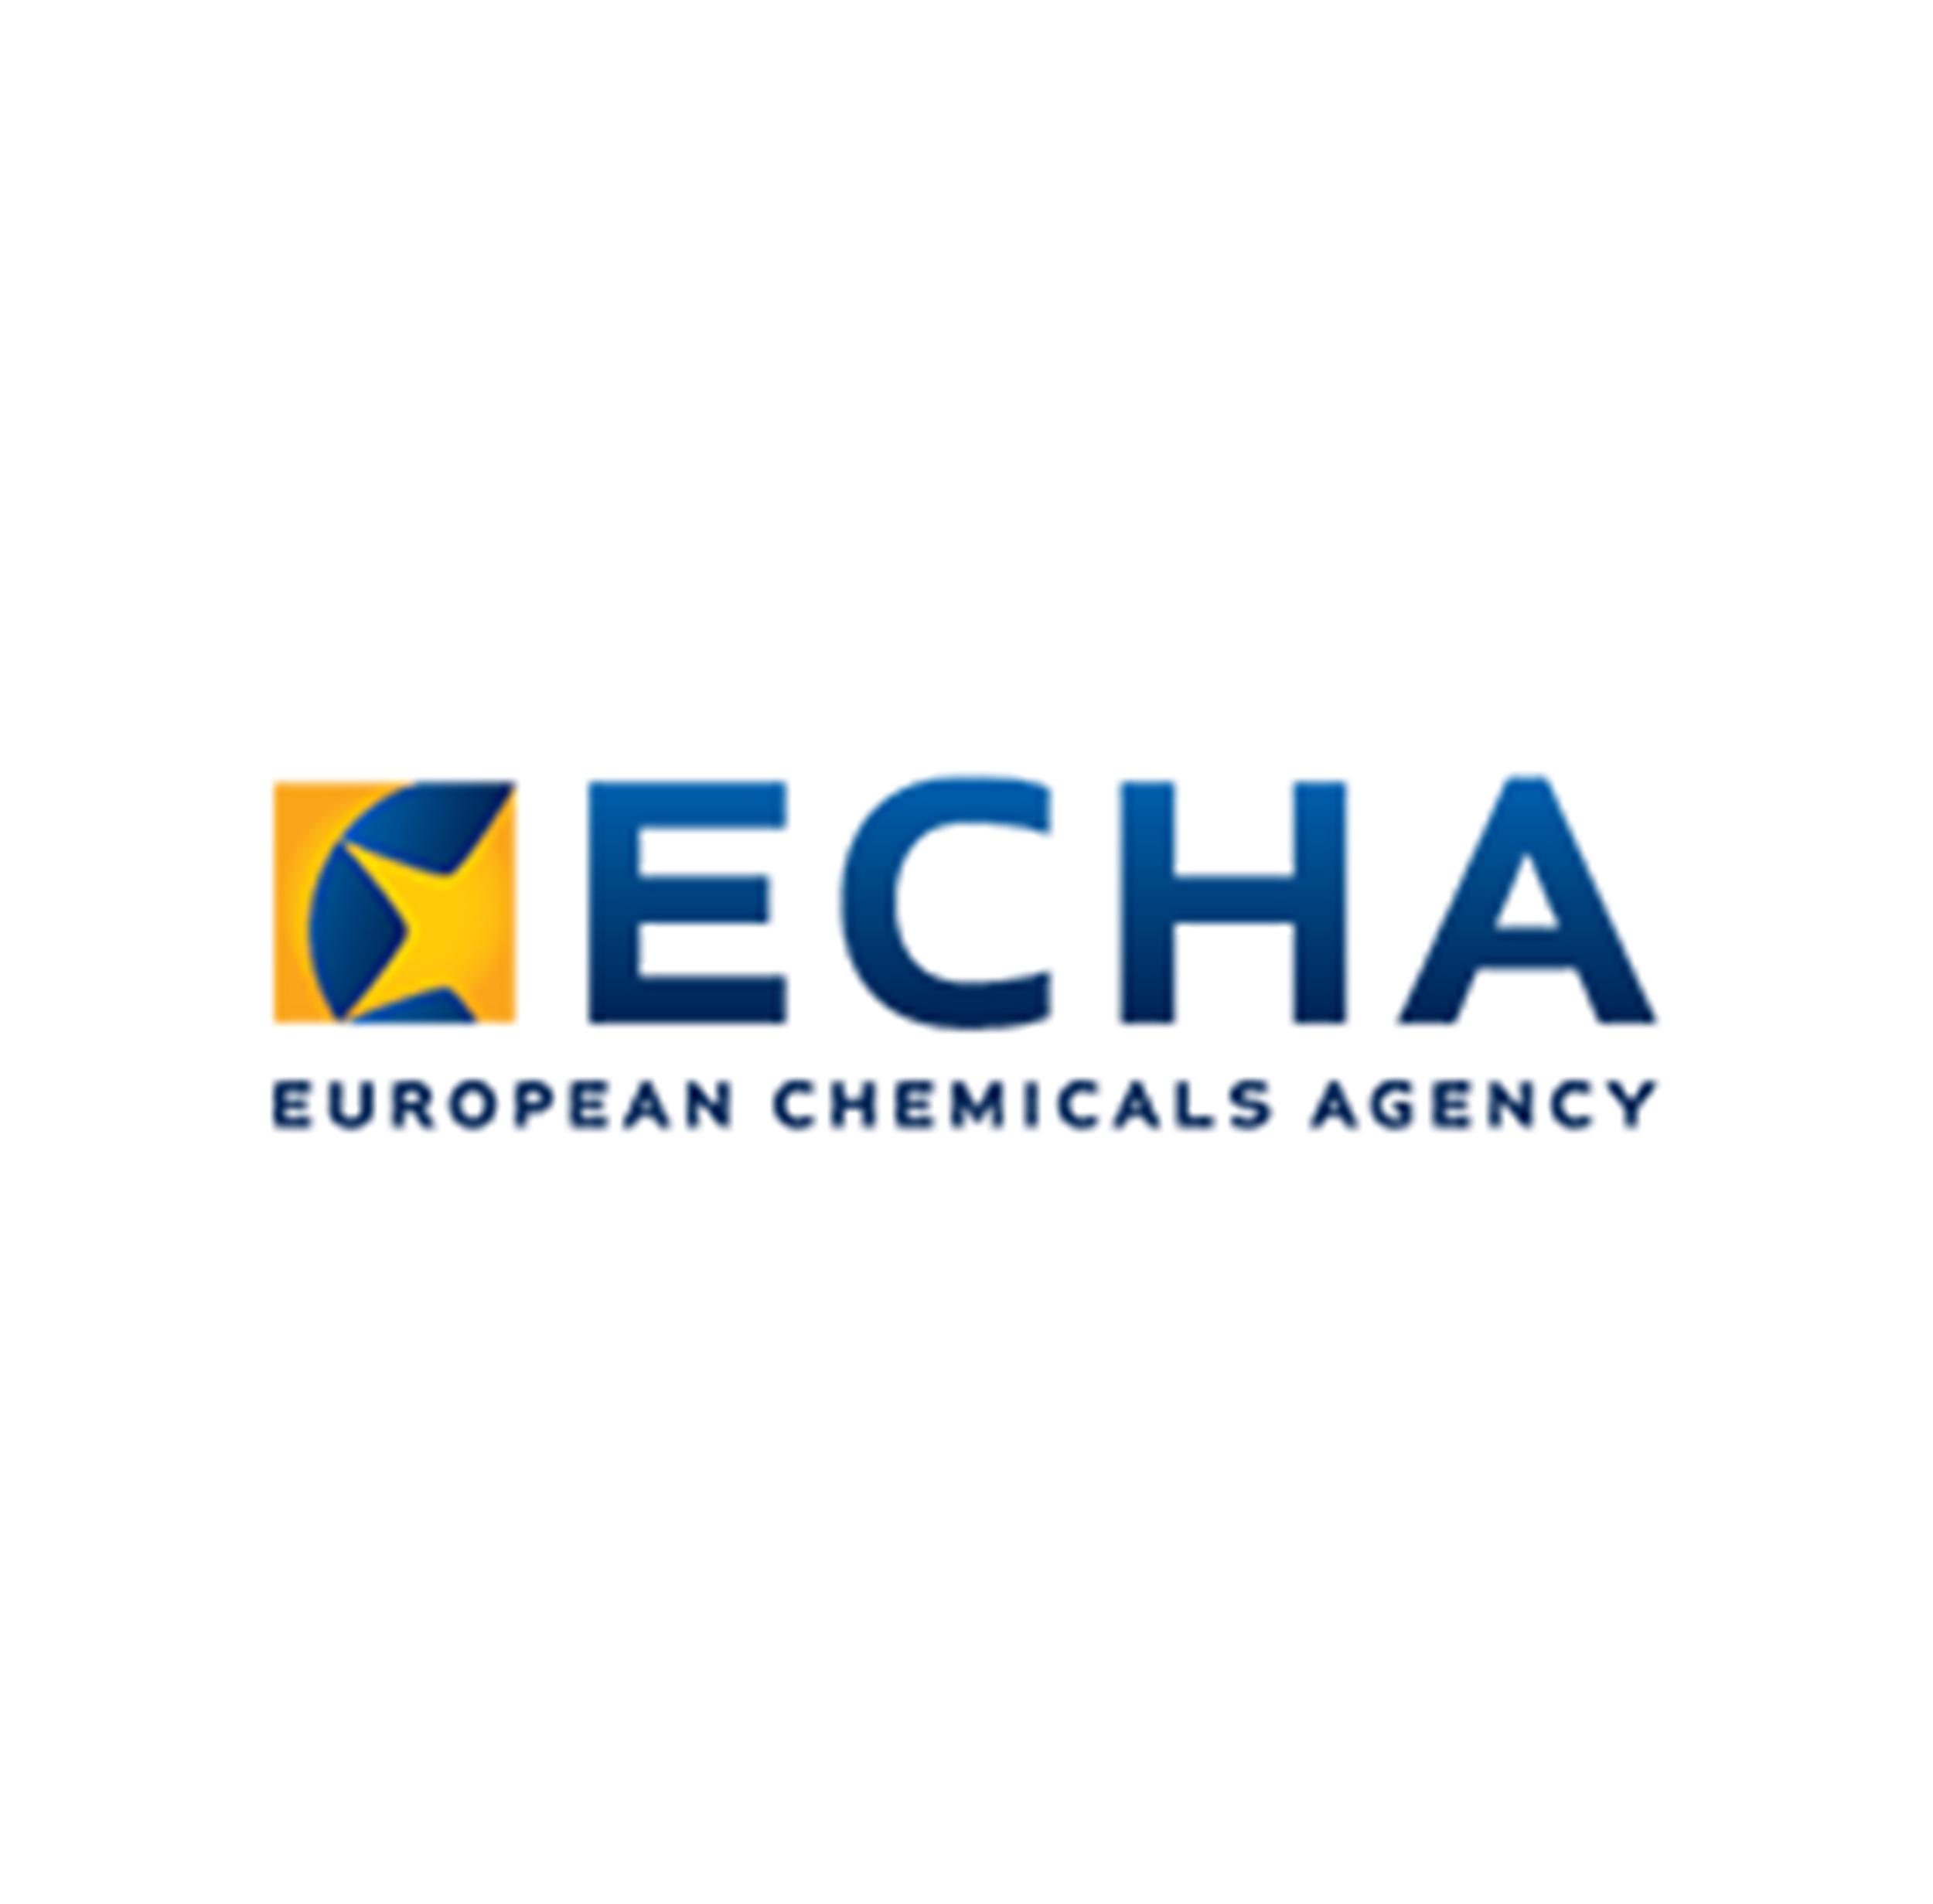 ECHA first logo.png